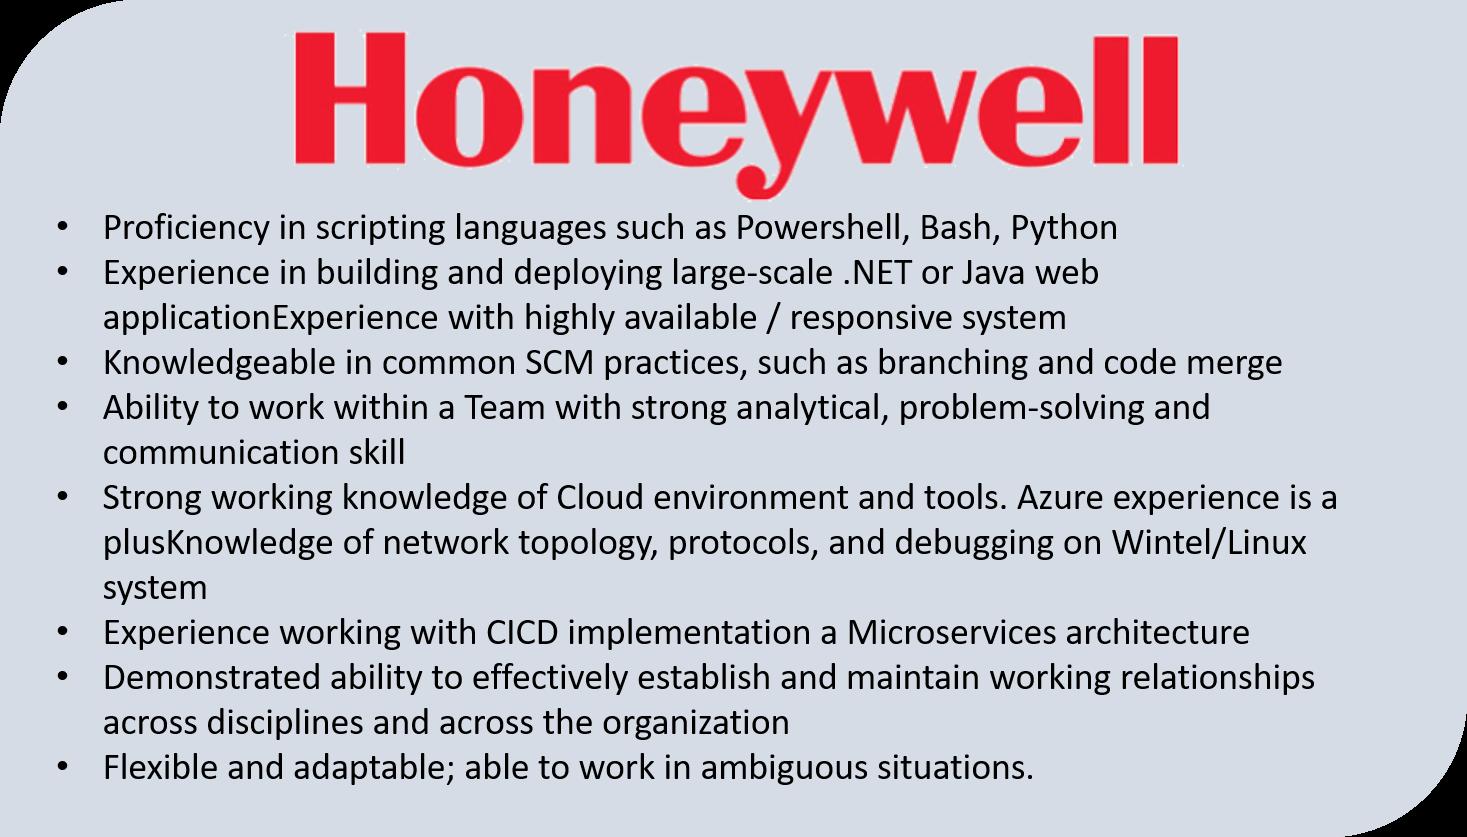 DevOps Job Description Honeywell - DevOps Engineer Resume - Edureka